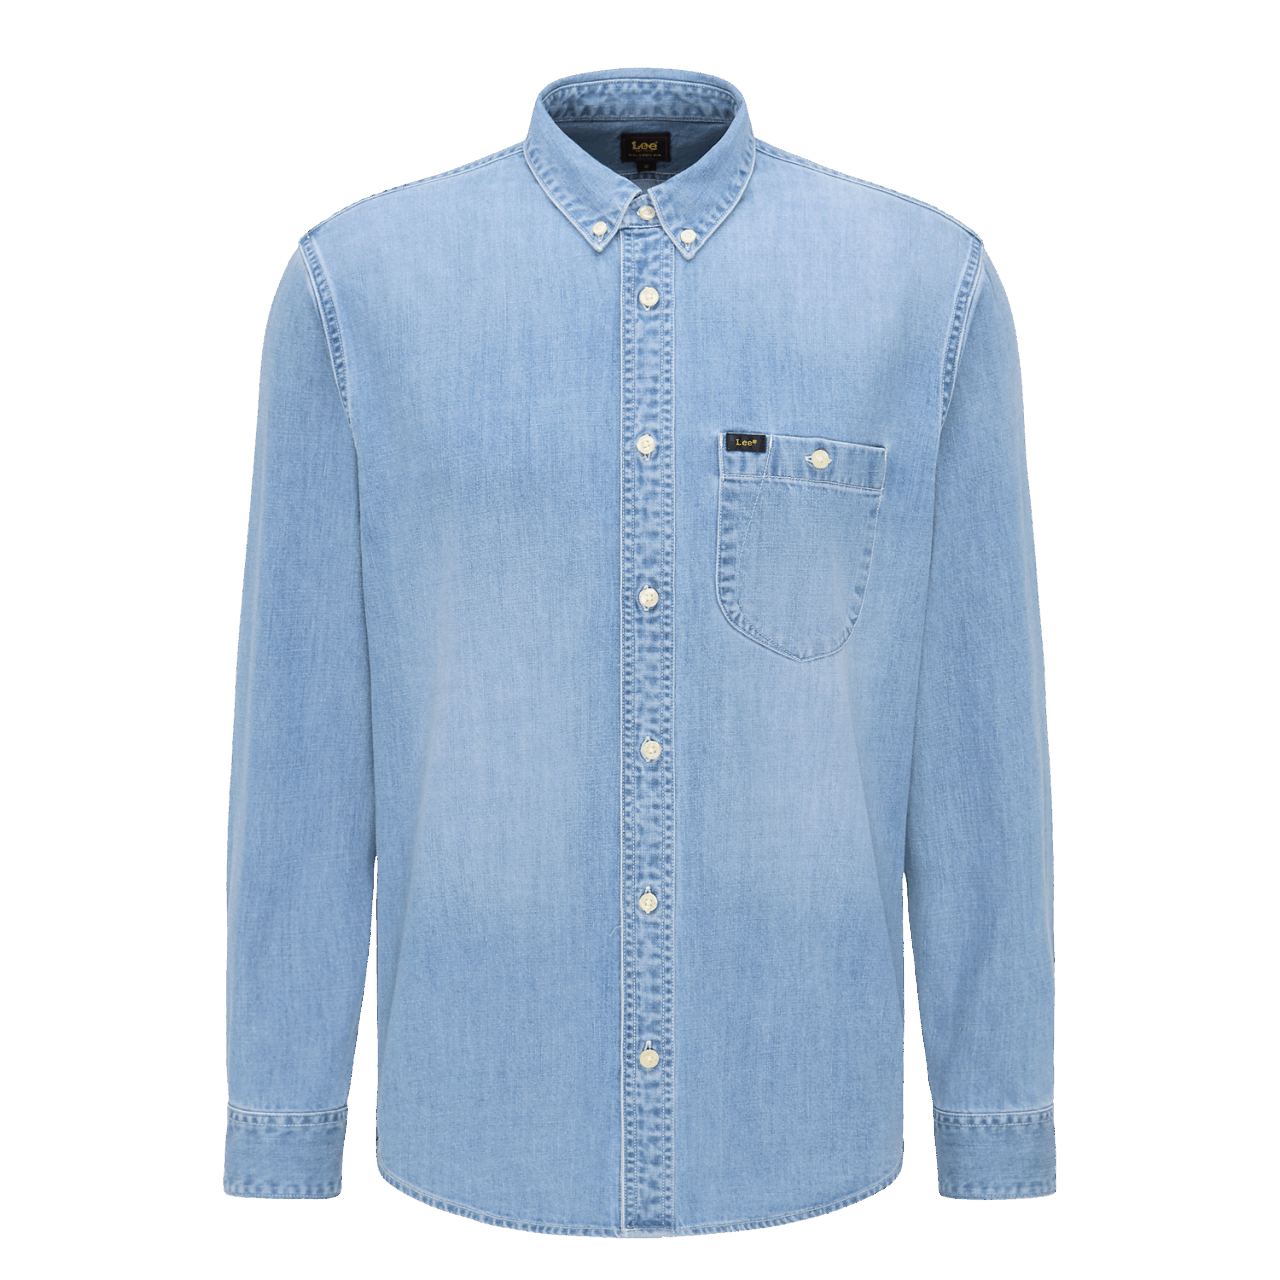 LEE Button Down Denim Shirt - Frost Blue